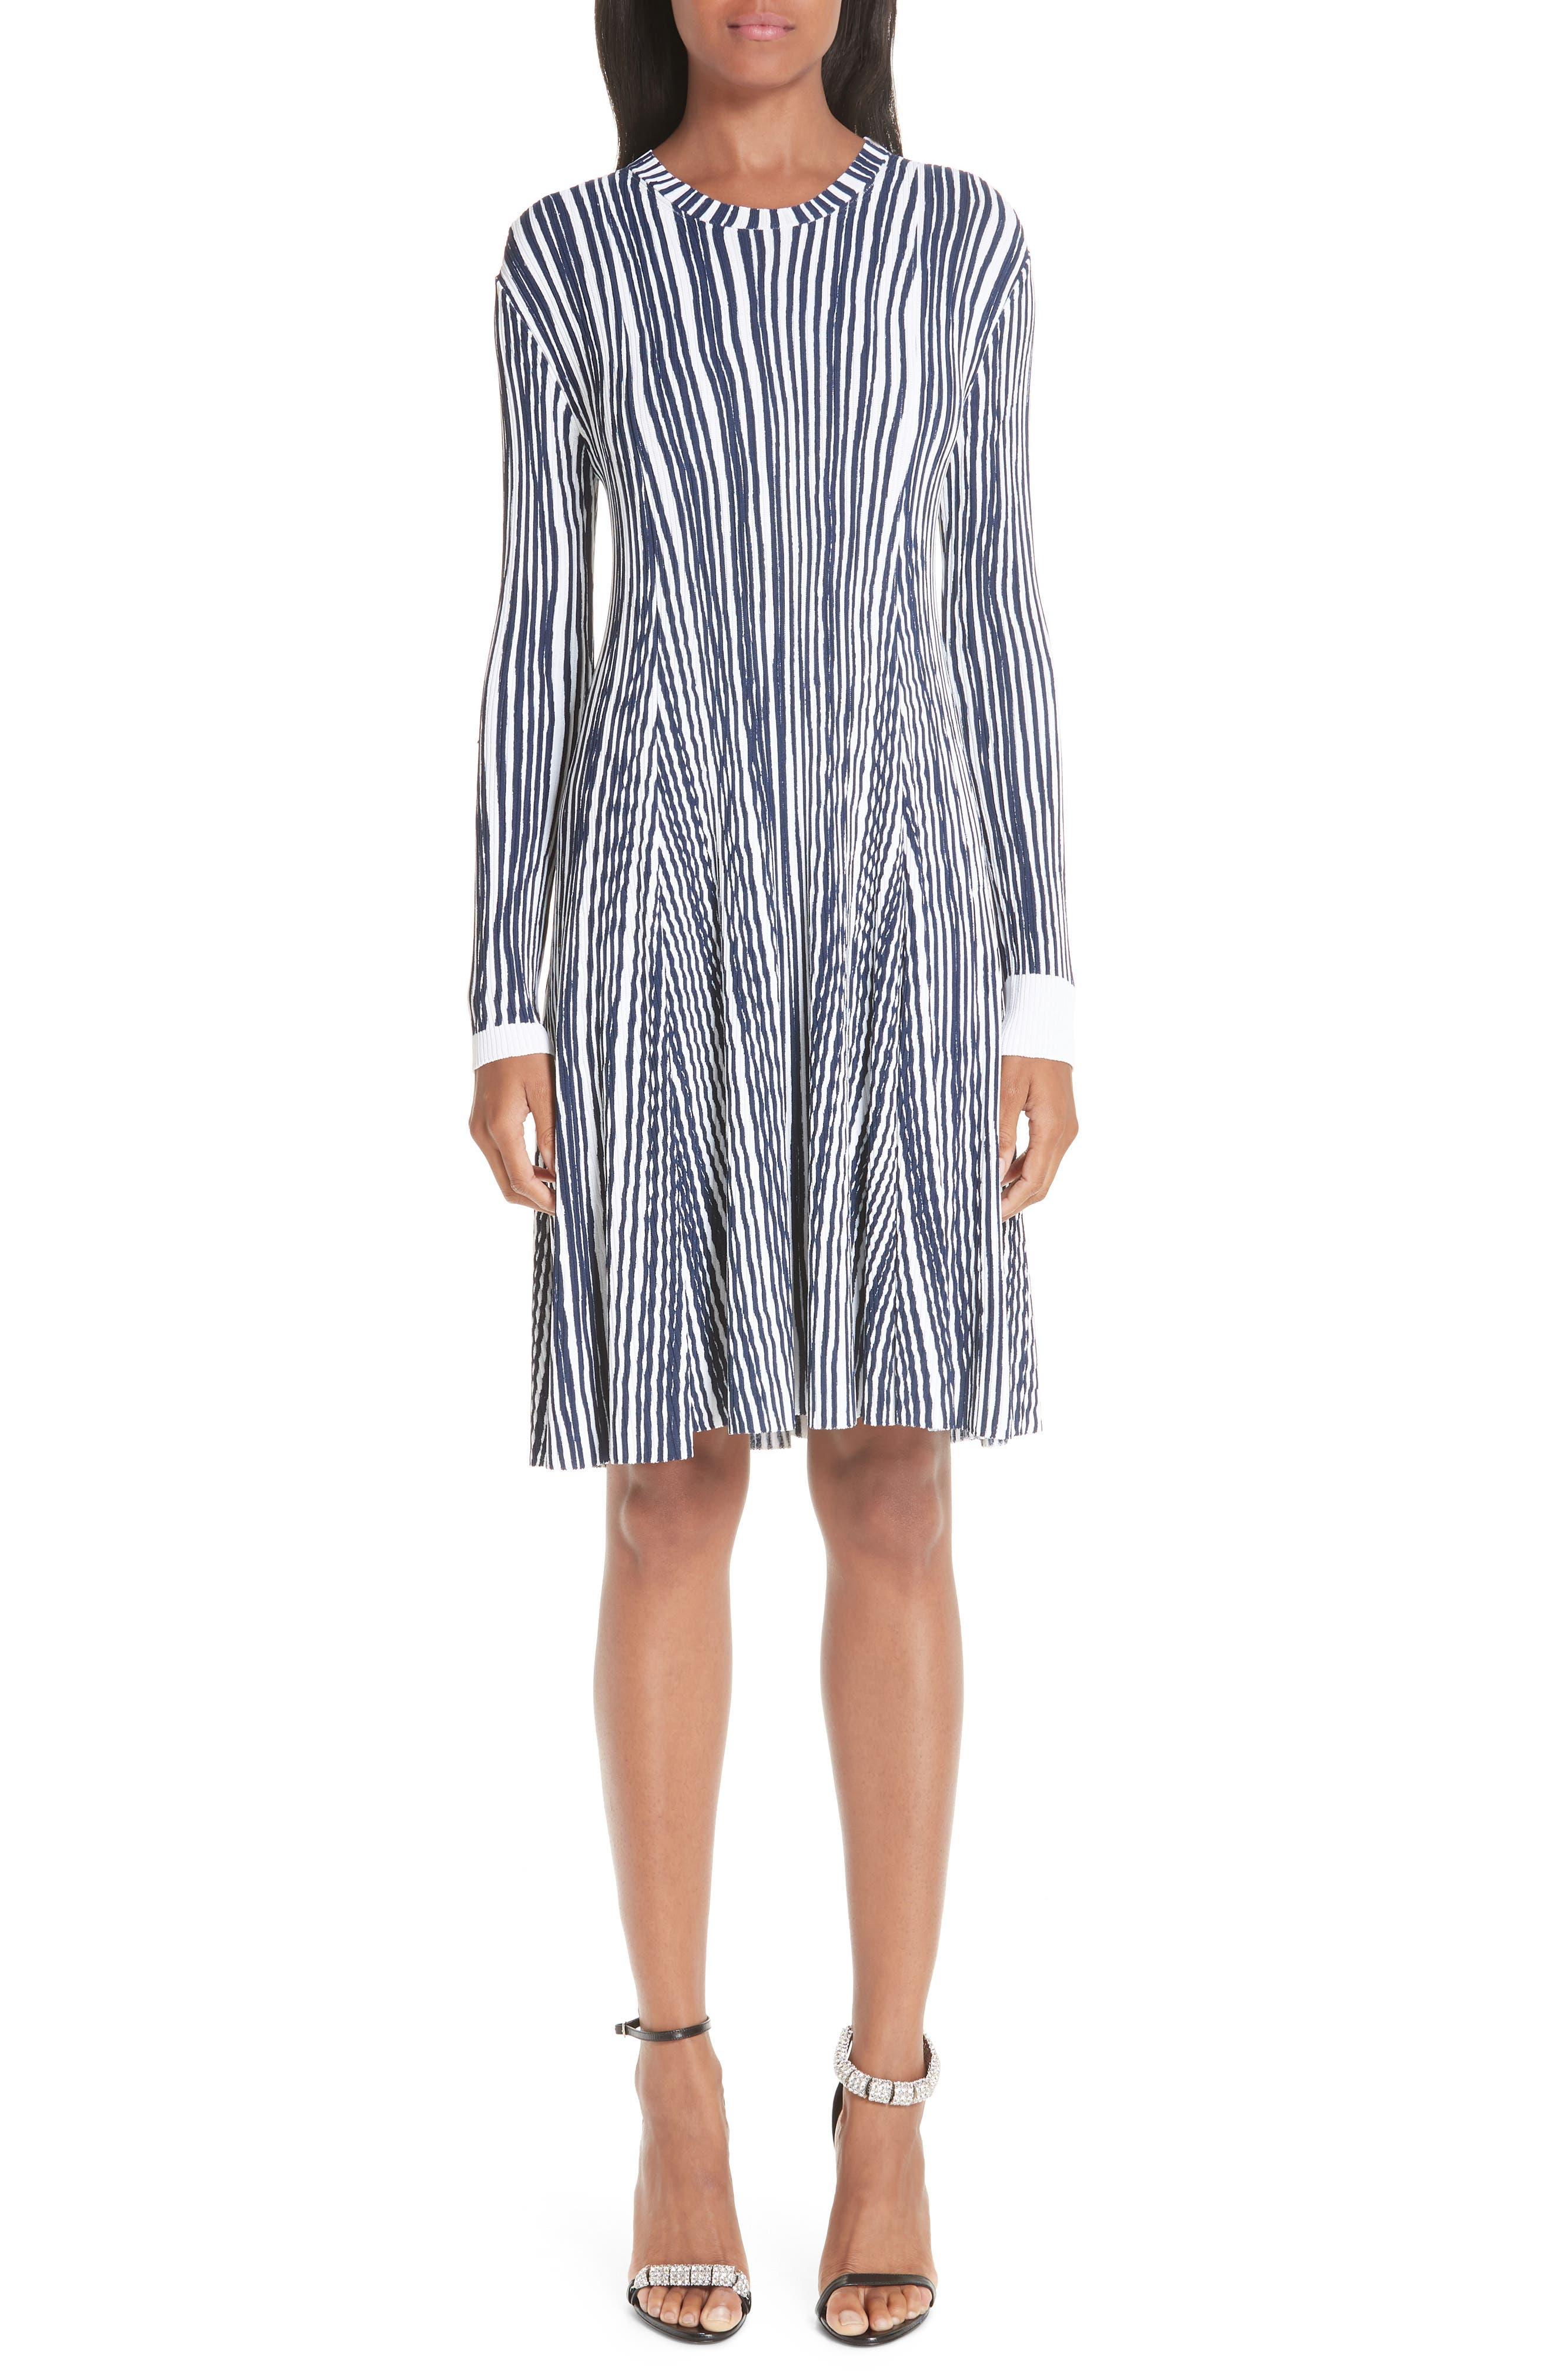 Calvin Klein 205W39Nyc Stripe Rib Knit Dress, Blue